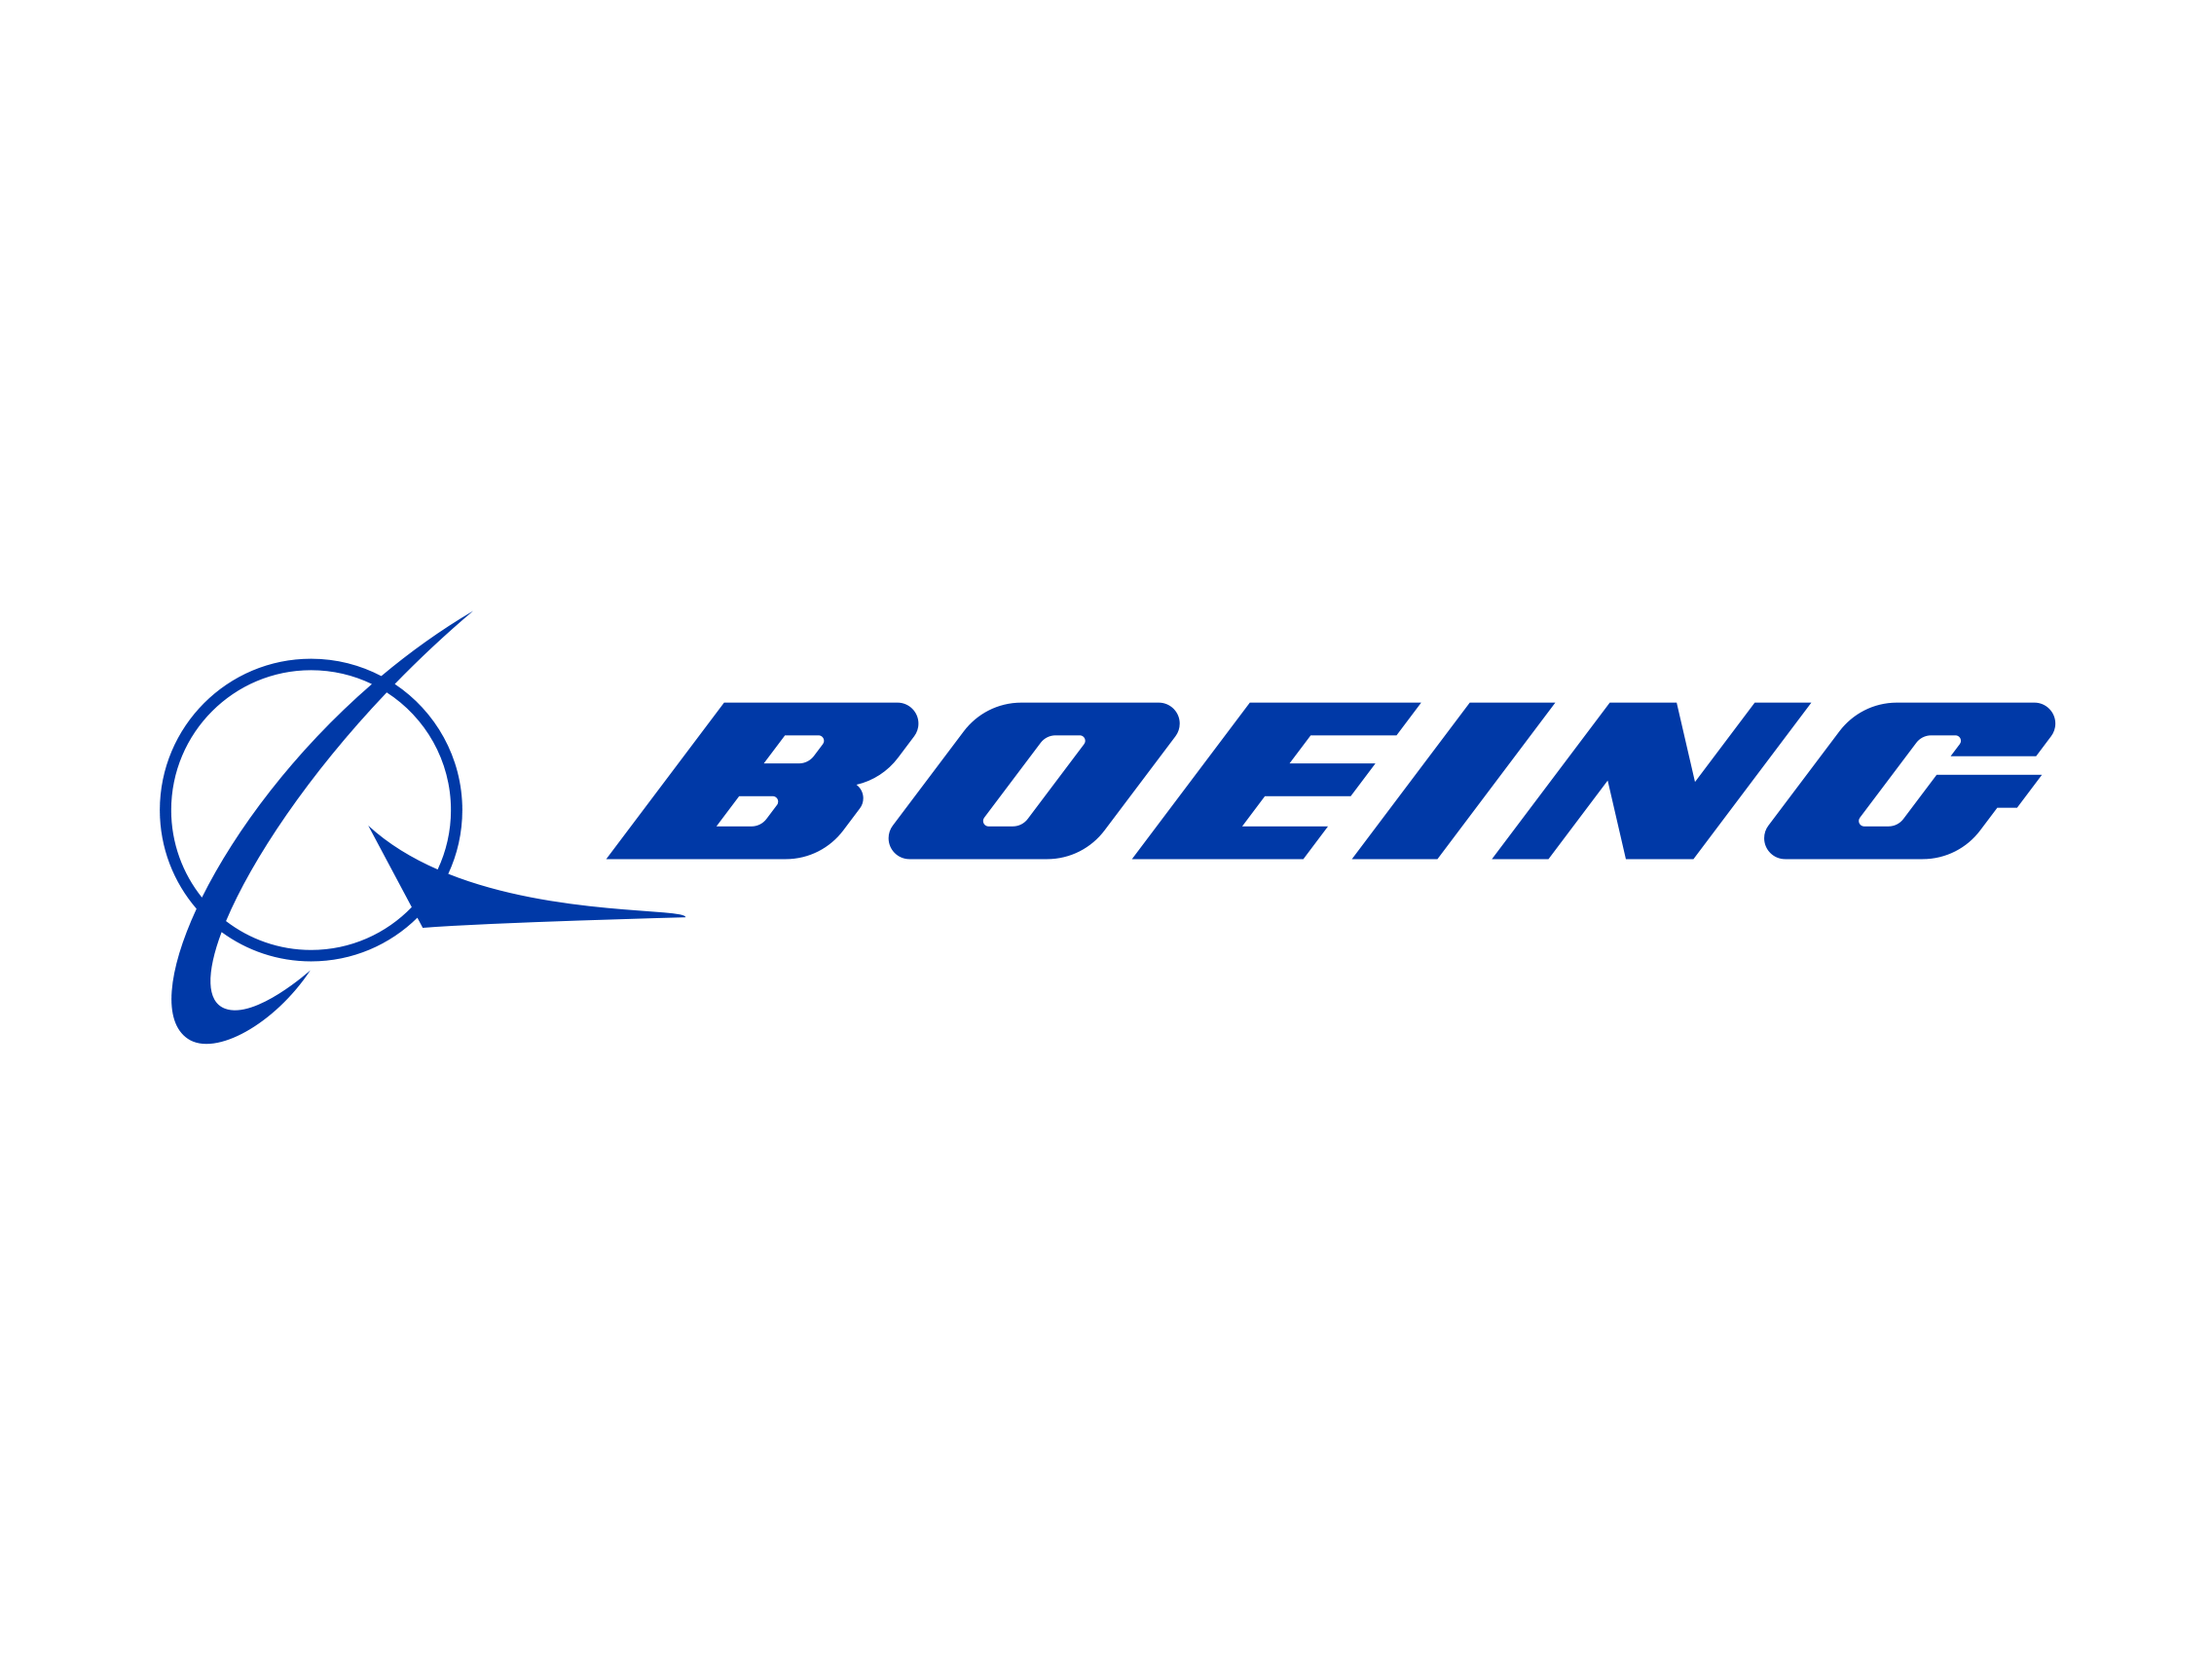 Boeing-logo-and-wordmark